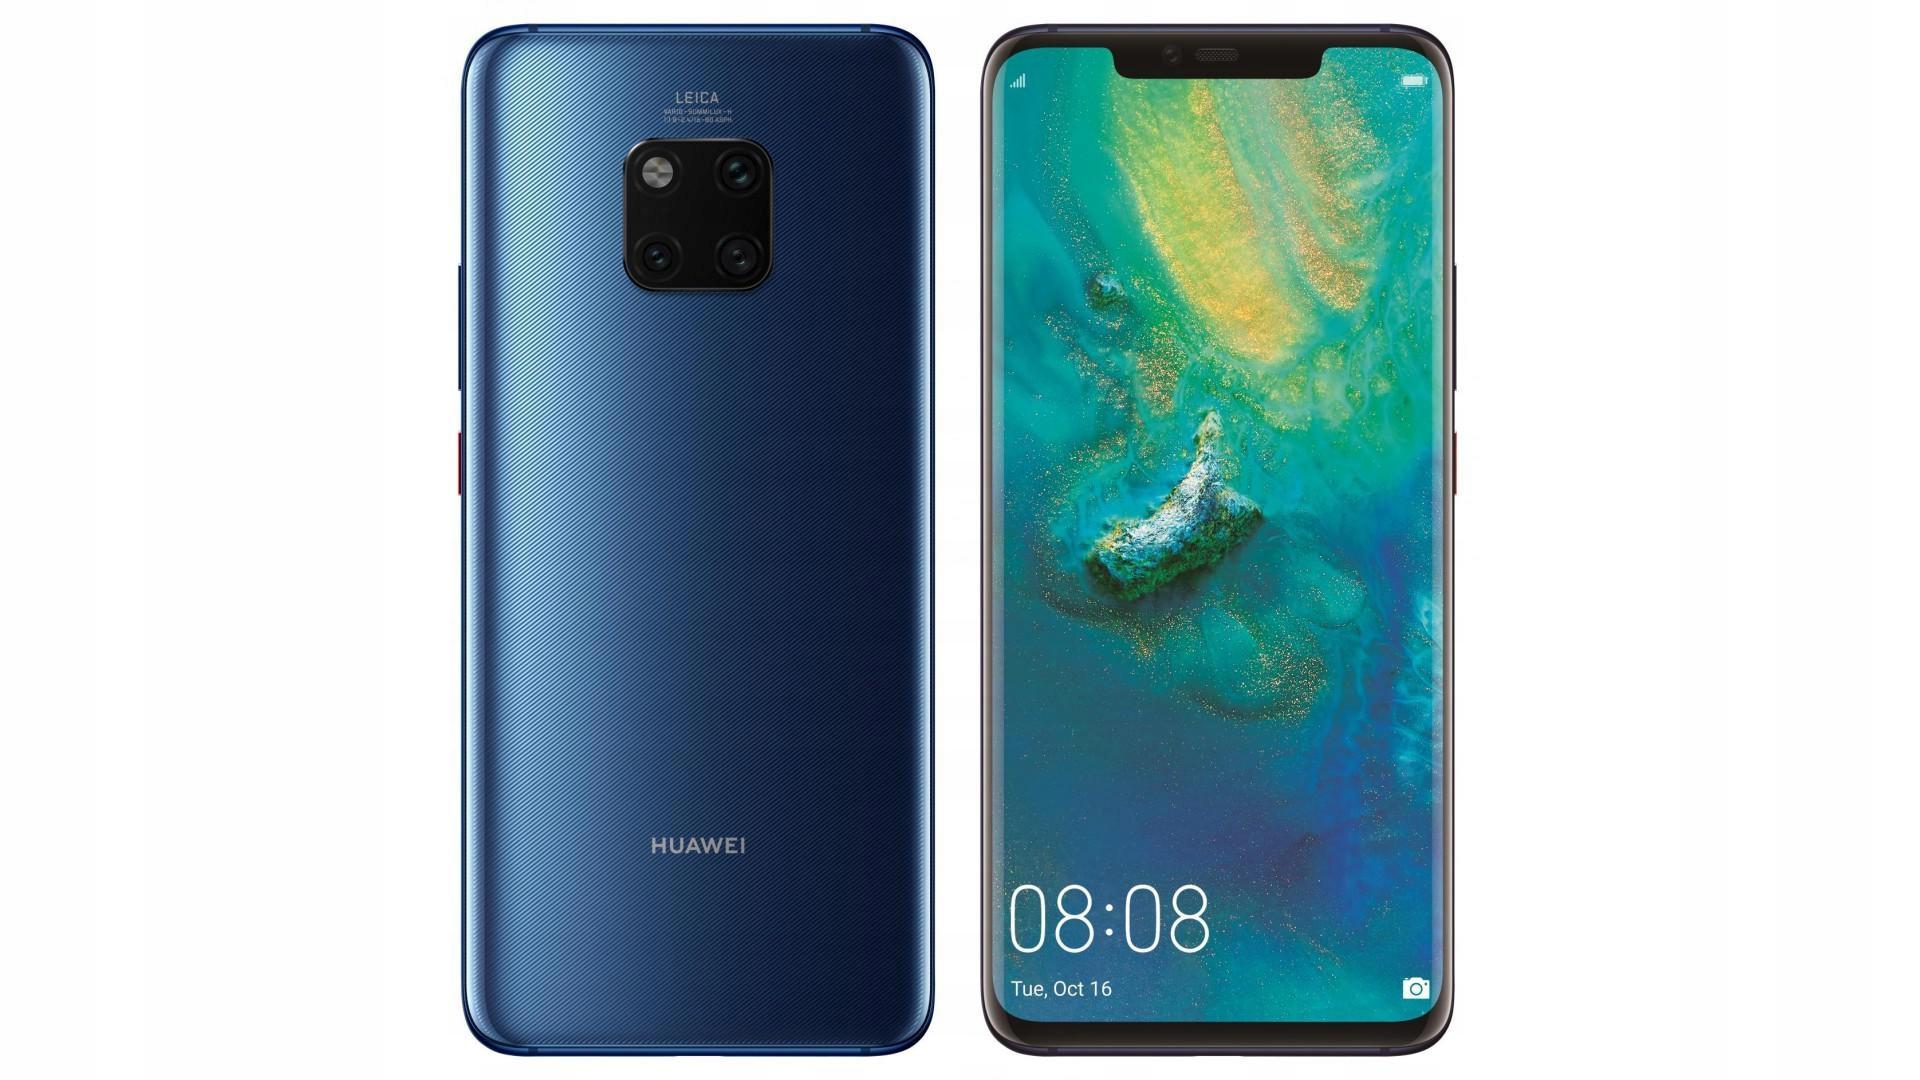 HUAWEI MATE 20 Pro BLUE Fv 23% Wys 24h Centrum